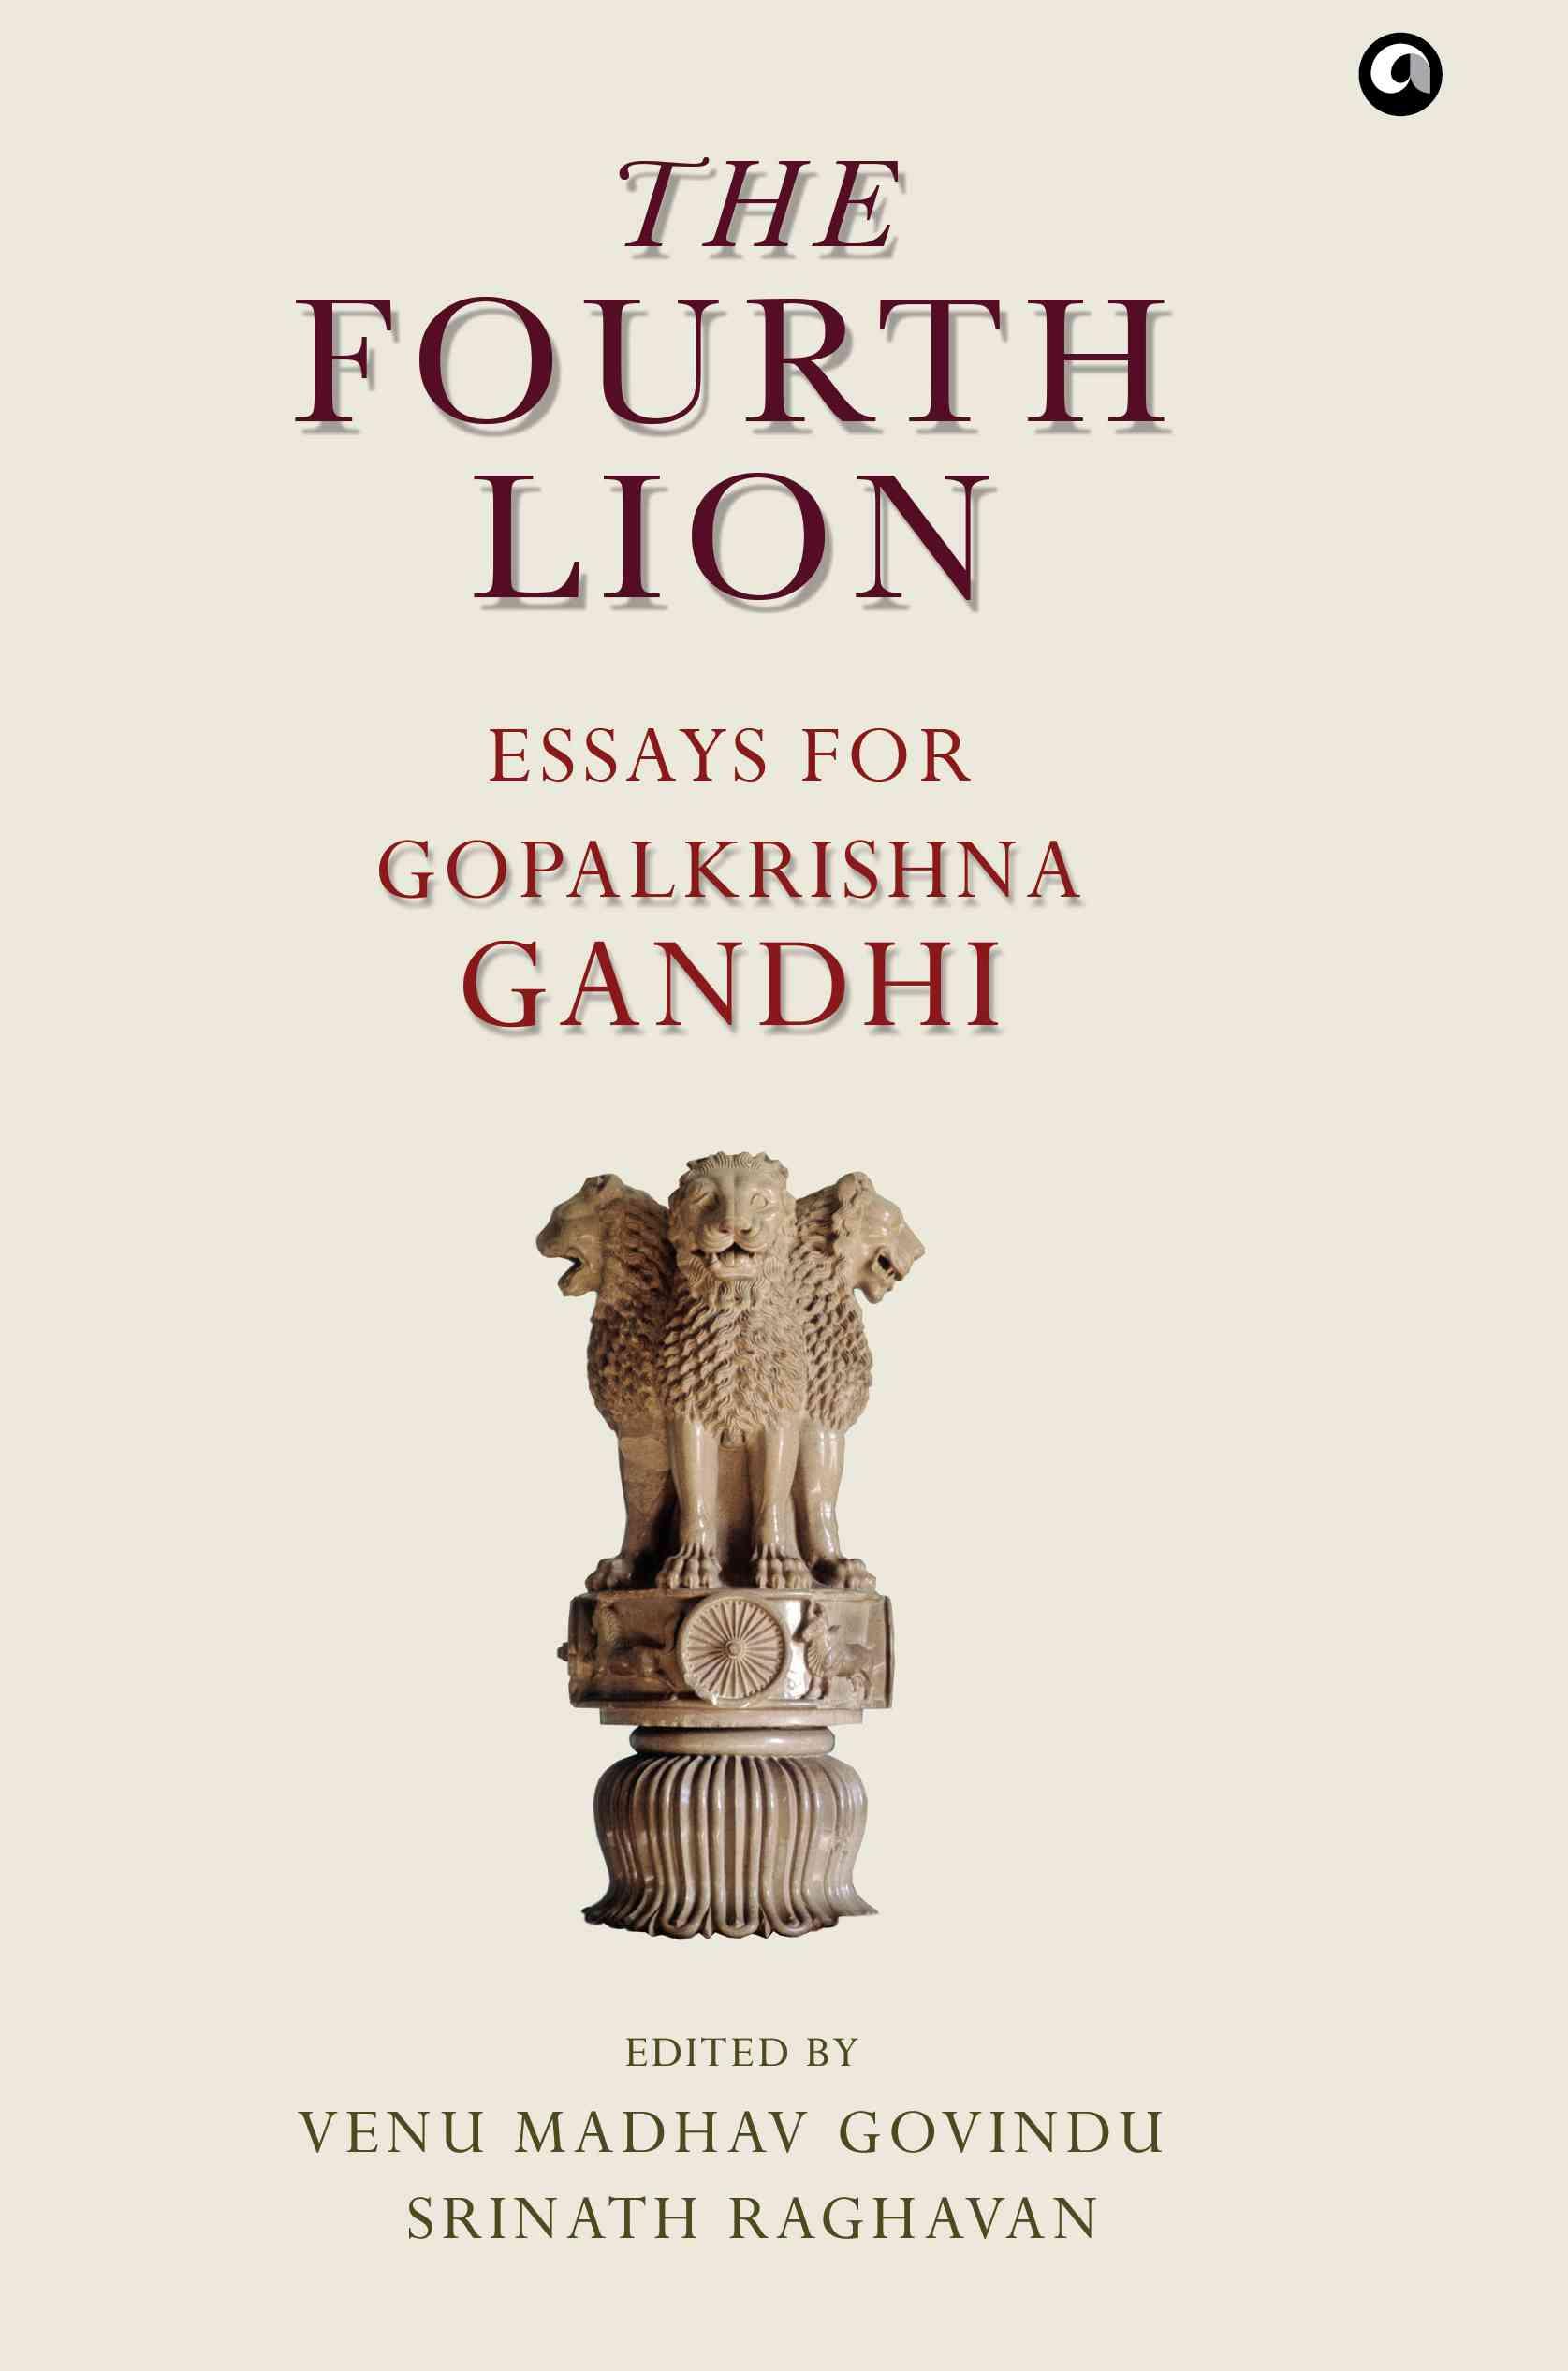 The Fourth Lion: Essays for Gopalkrishna Gandhi